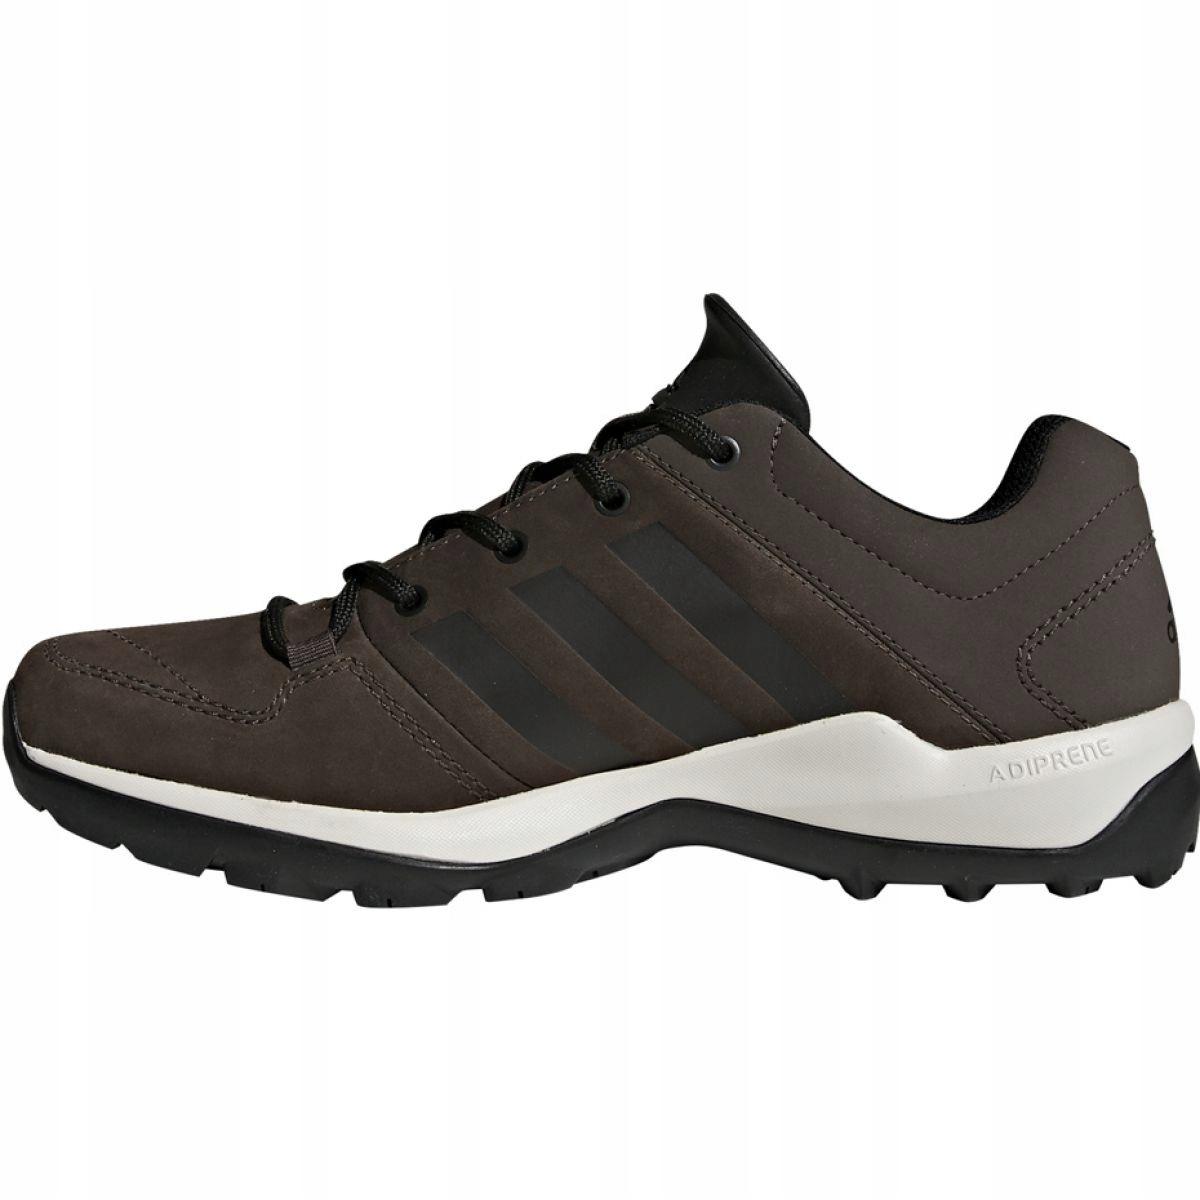 Adidas Schuhe Gold pragmaticus